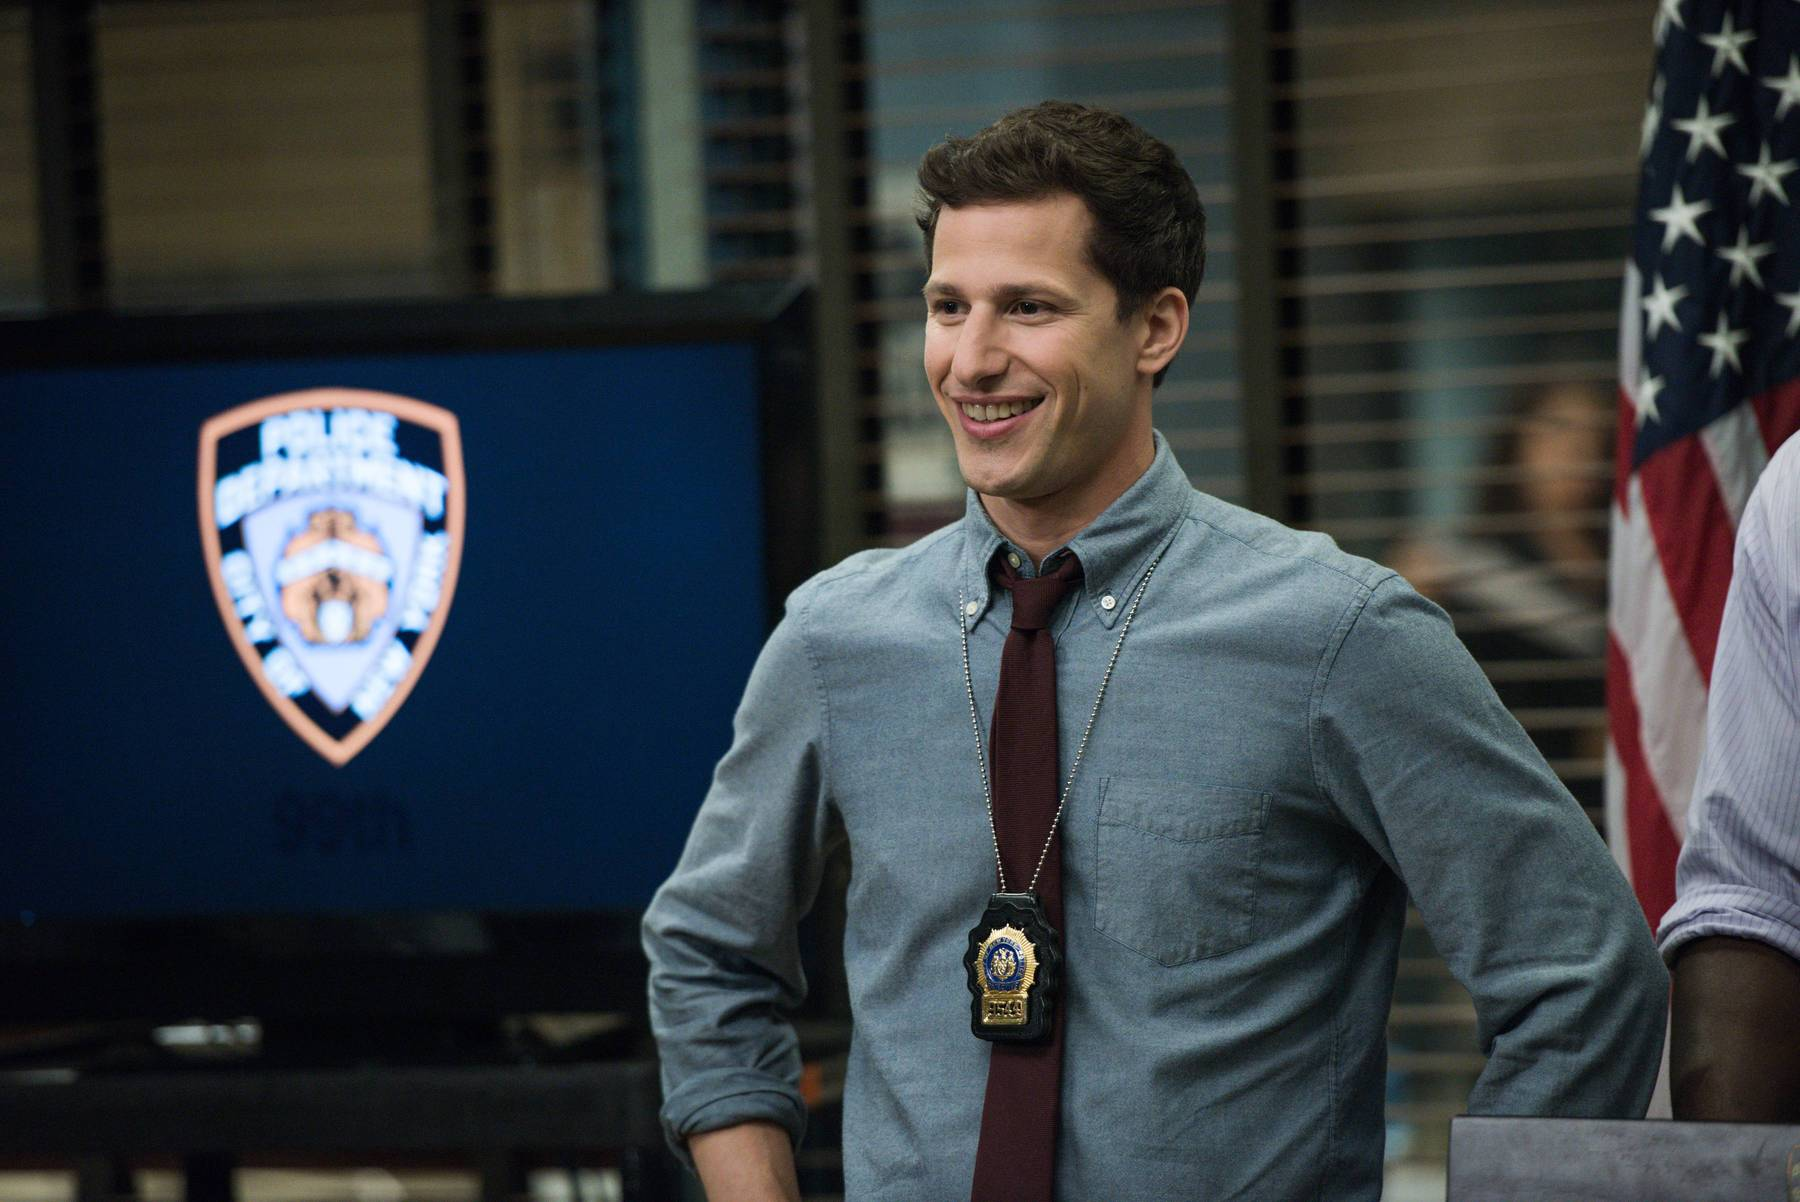 a white man plays a police officer on Brooklyn Nine-Nine